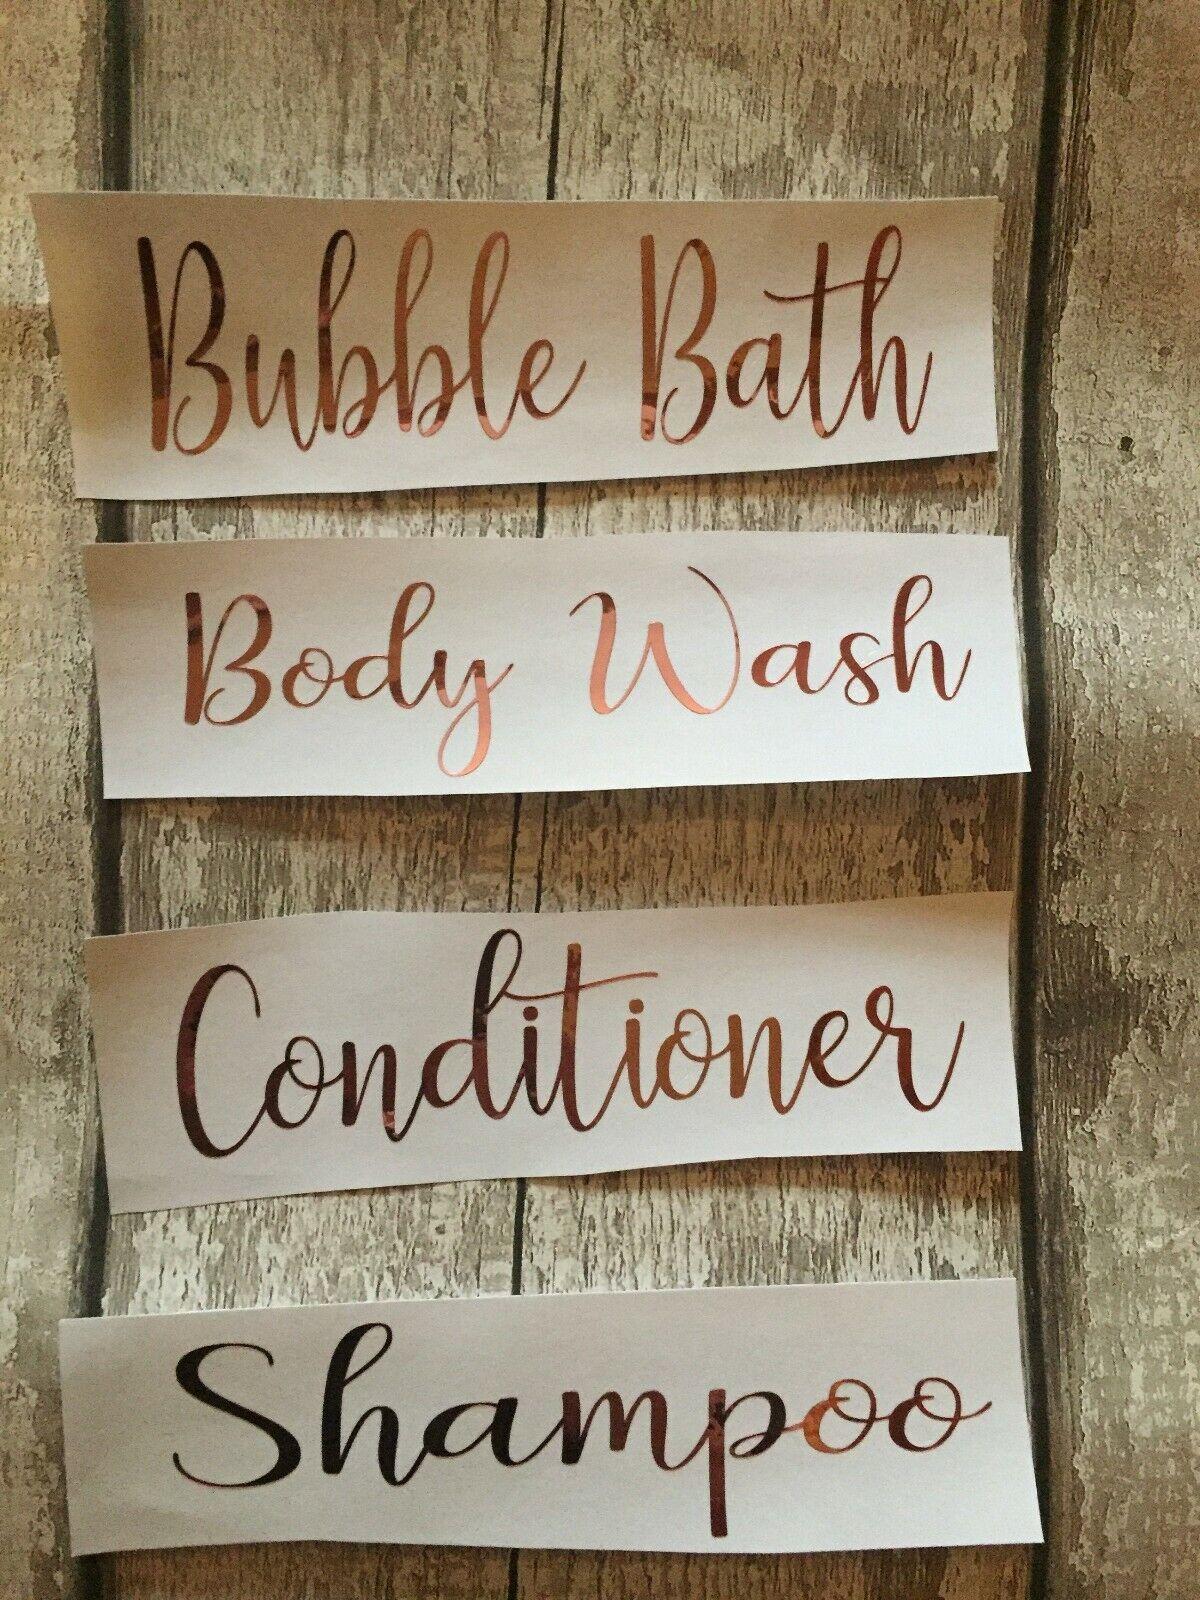 Bathroom Bottle Vinyl Stickers Labels Shampoo Conditioner Body Wash 99p per word